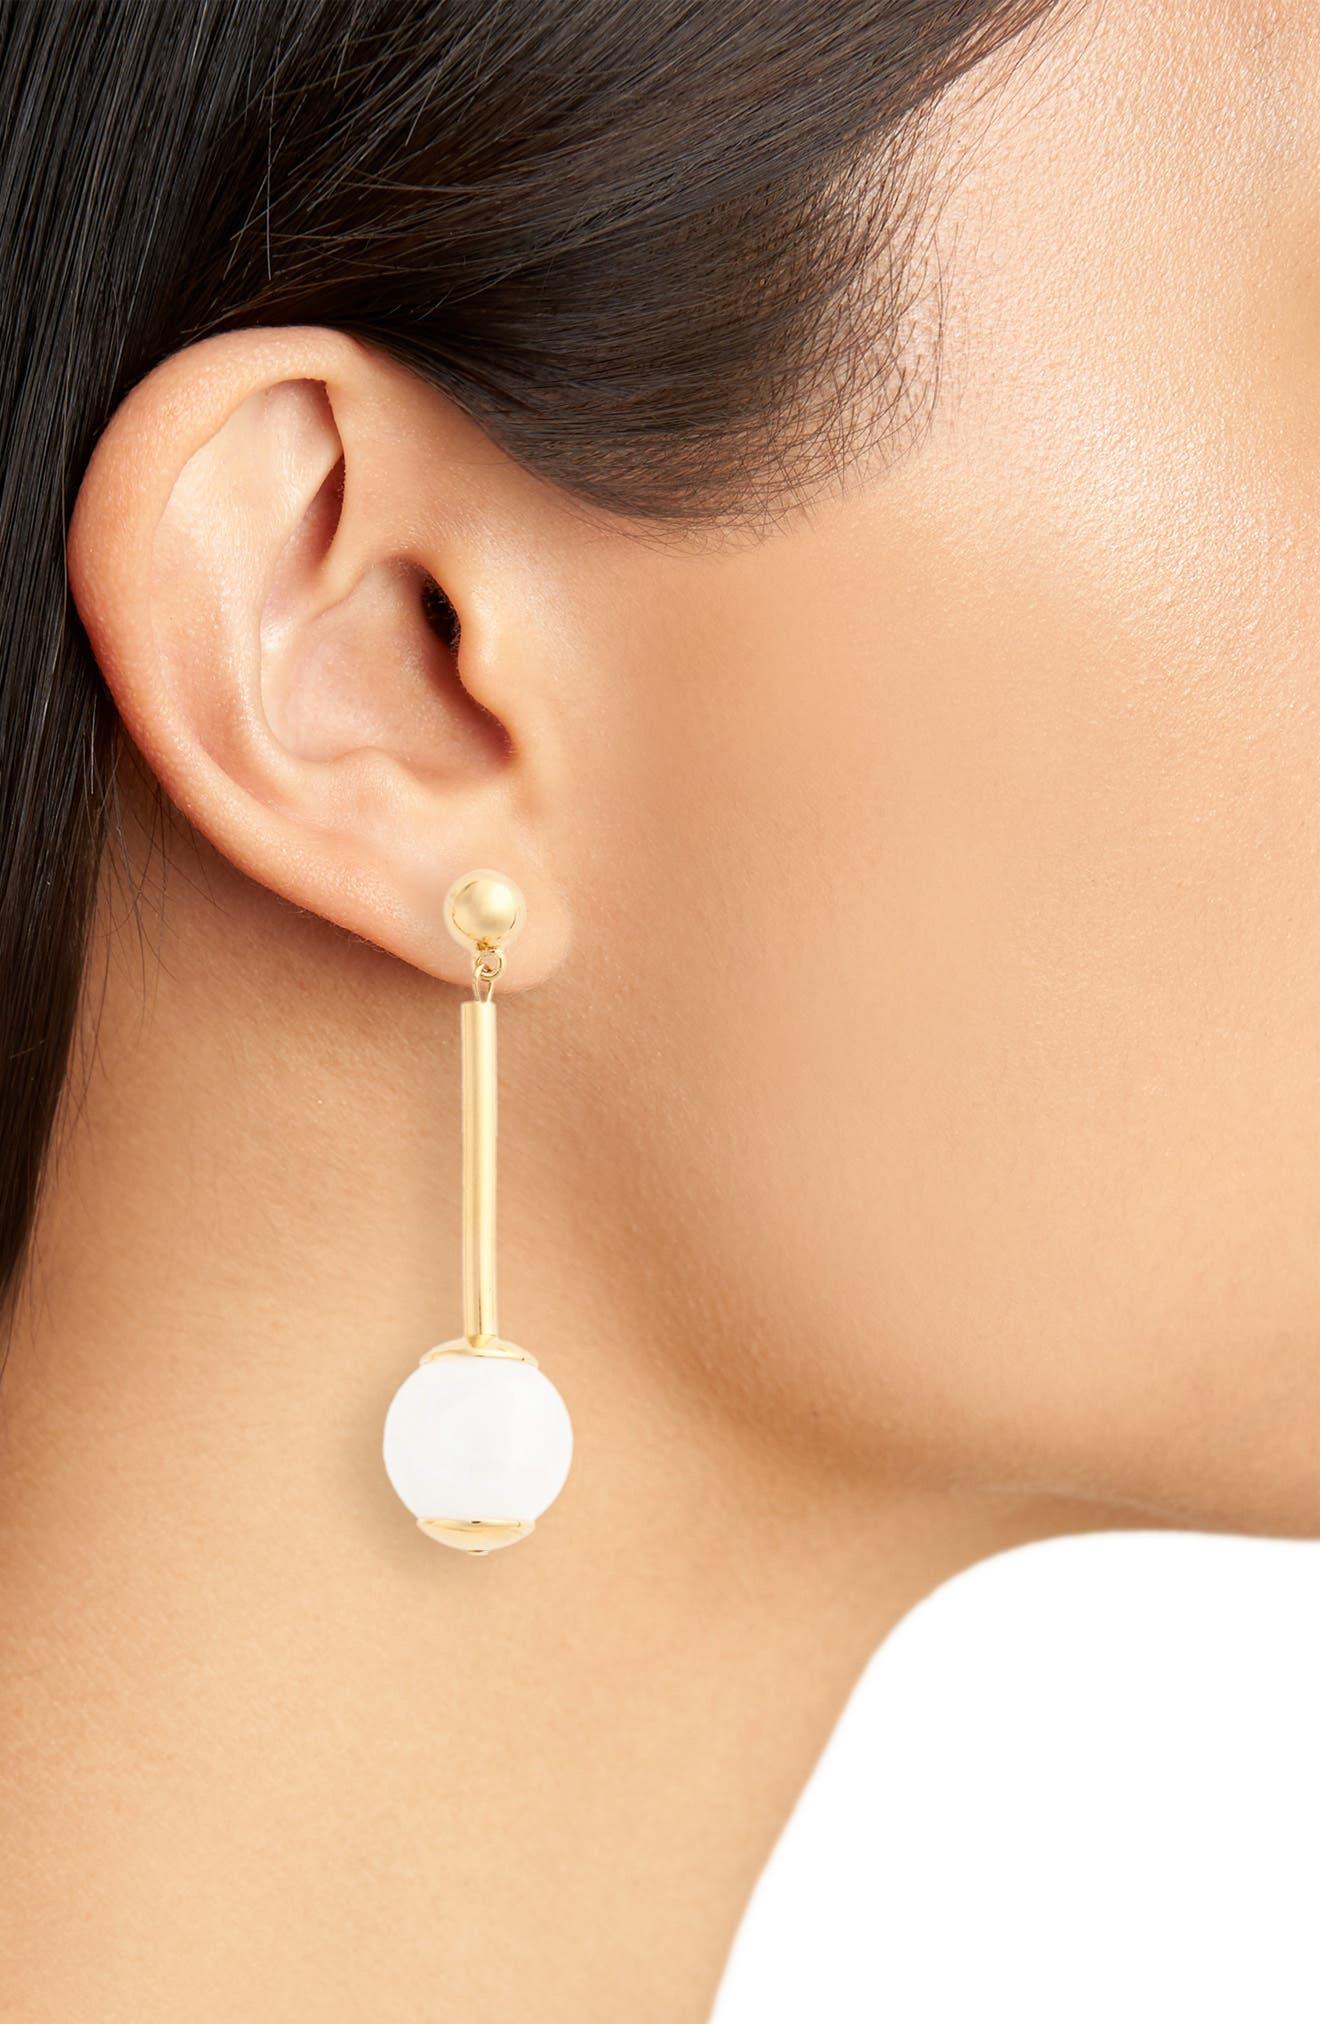 Pendulum Earrings,                             Alternate thumbnail 2, color,                             100